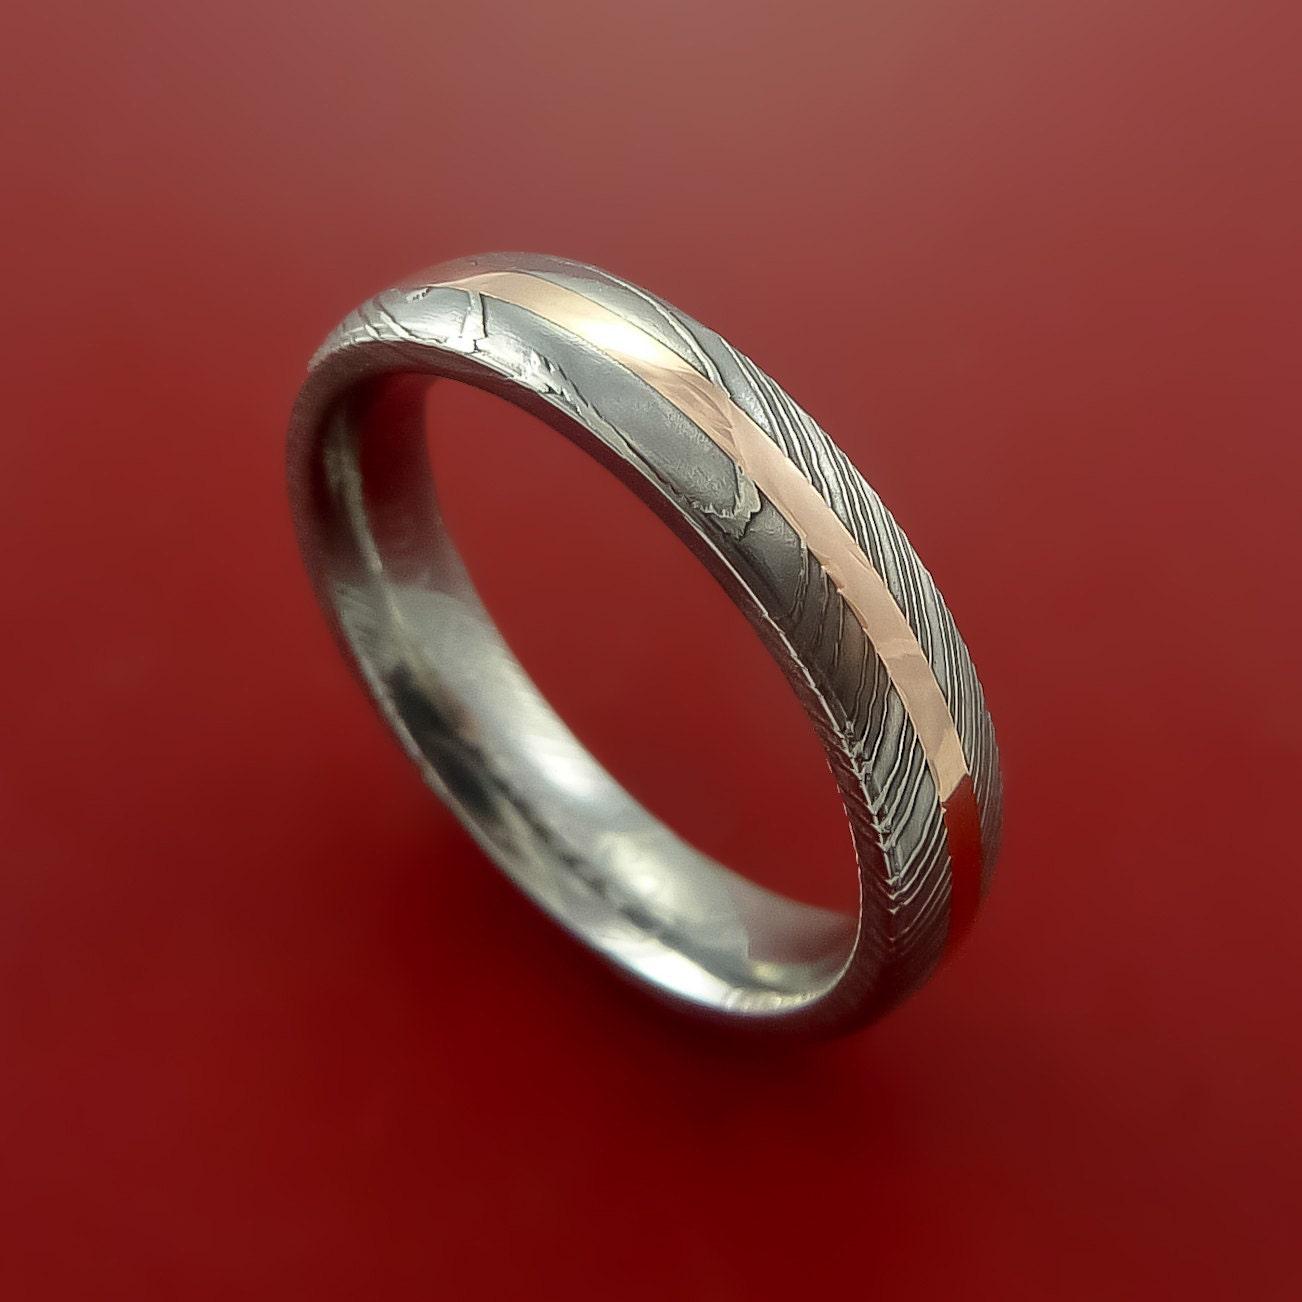 Damascus Steel Ring Wedding Band Genuine Craftsmanship Made |Damascus Steel Rings For Women